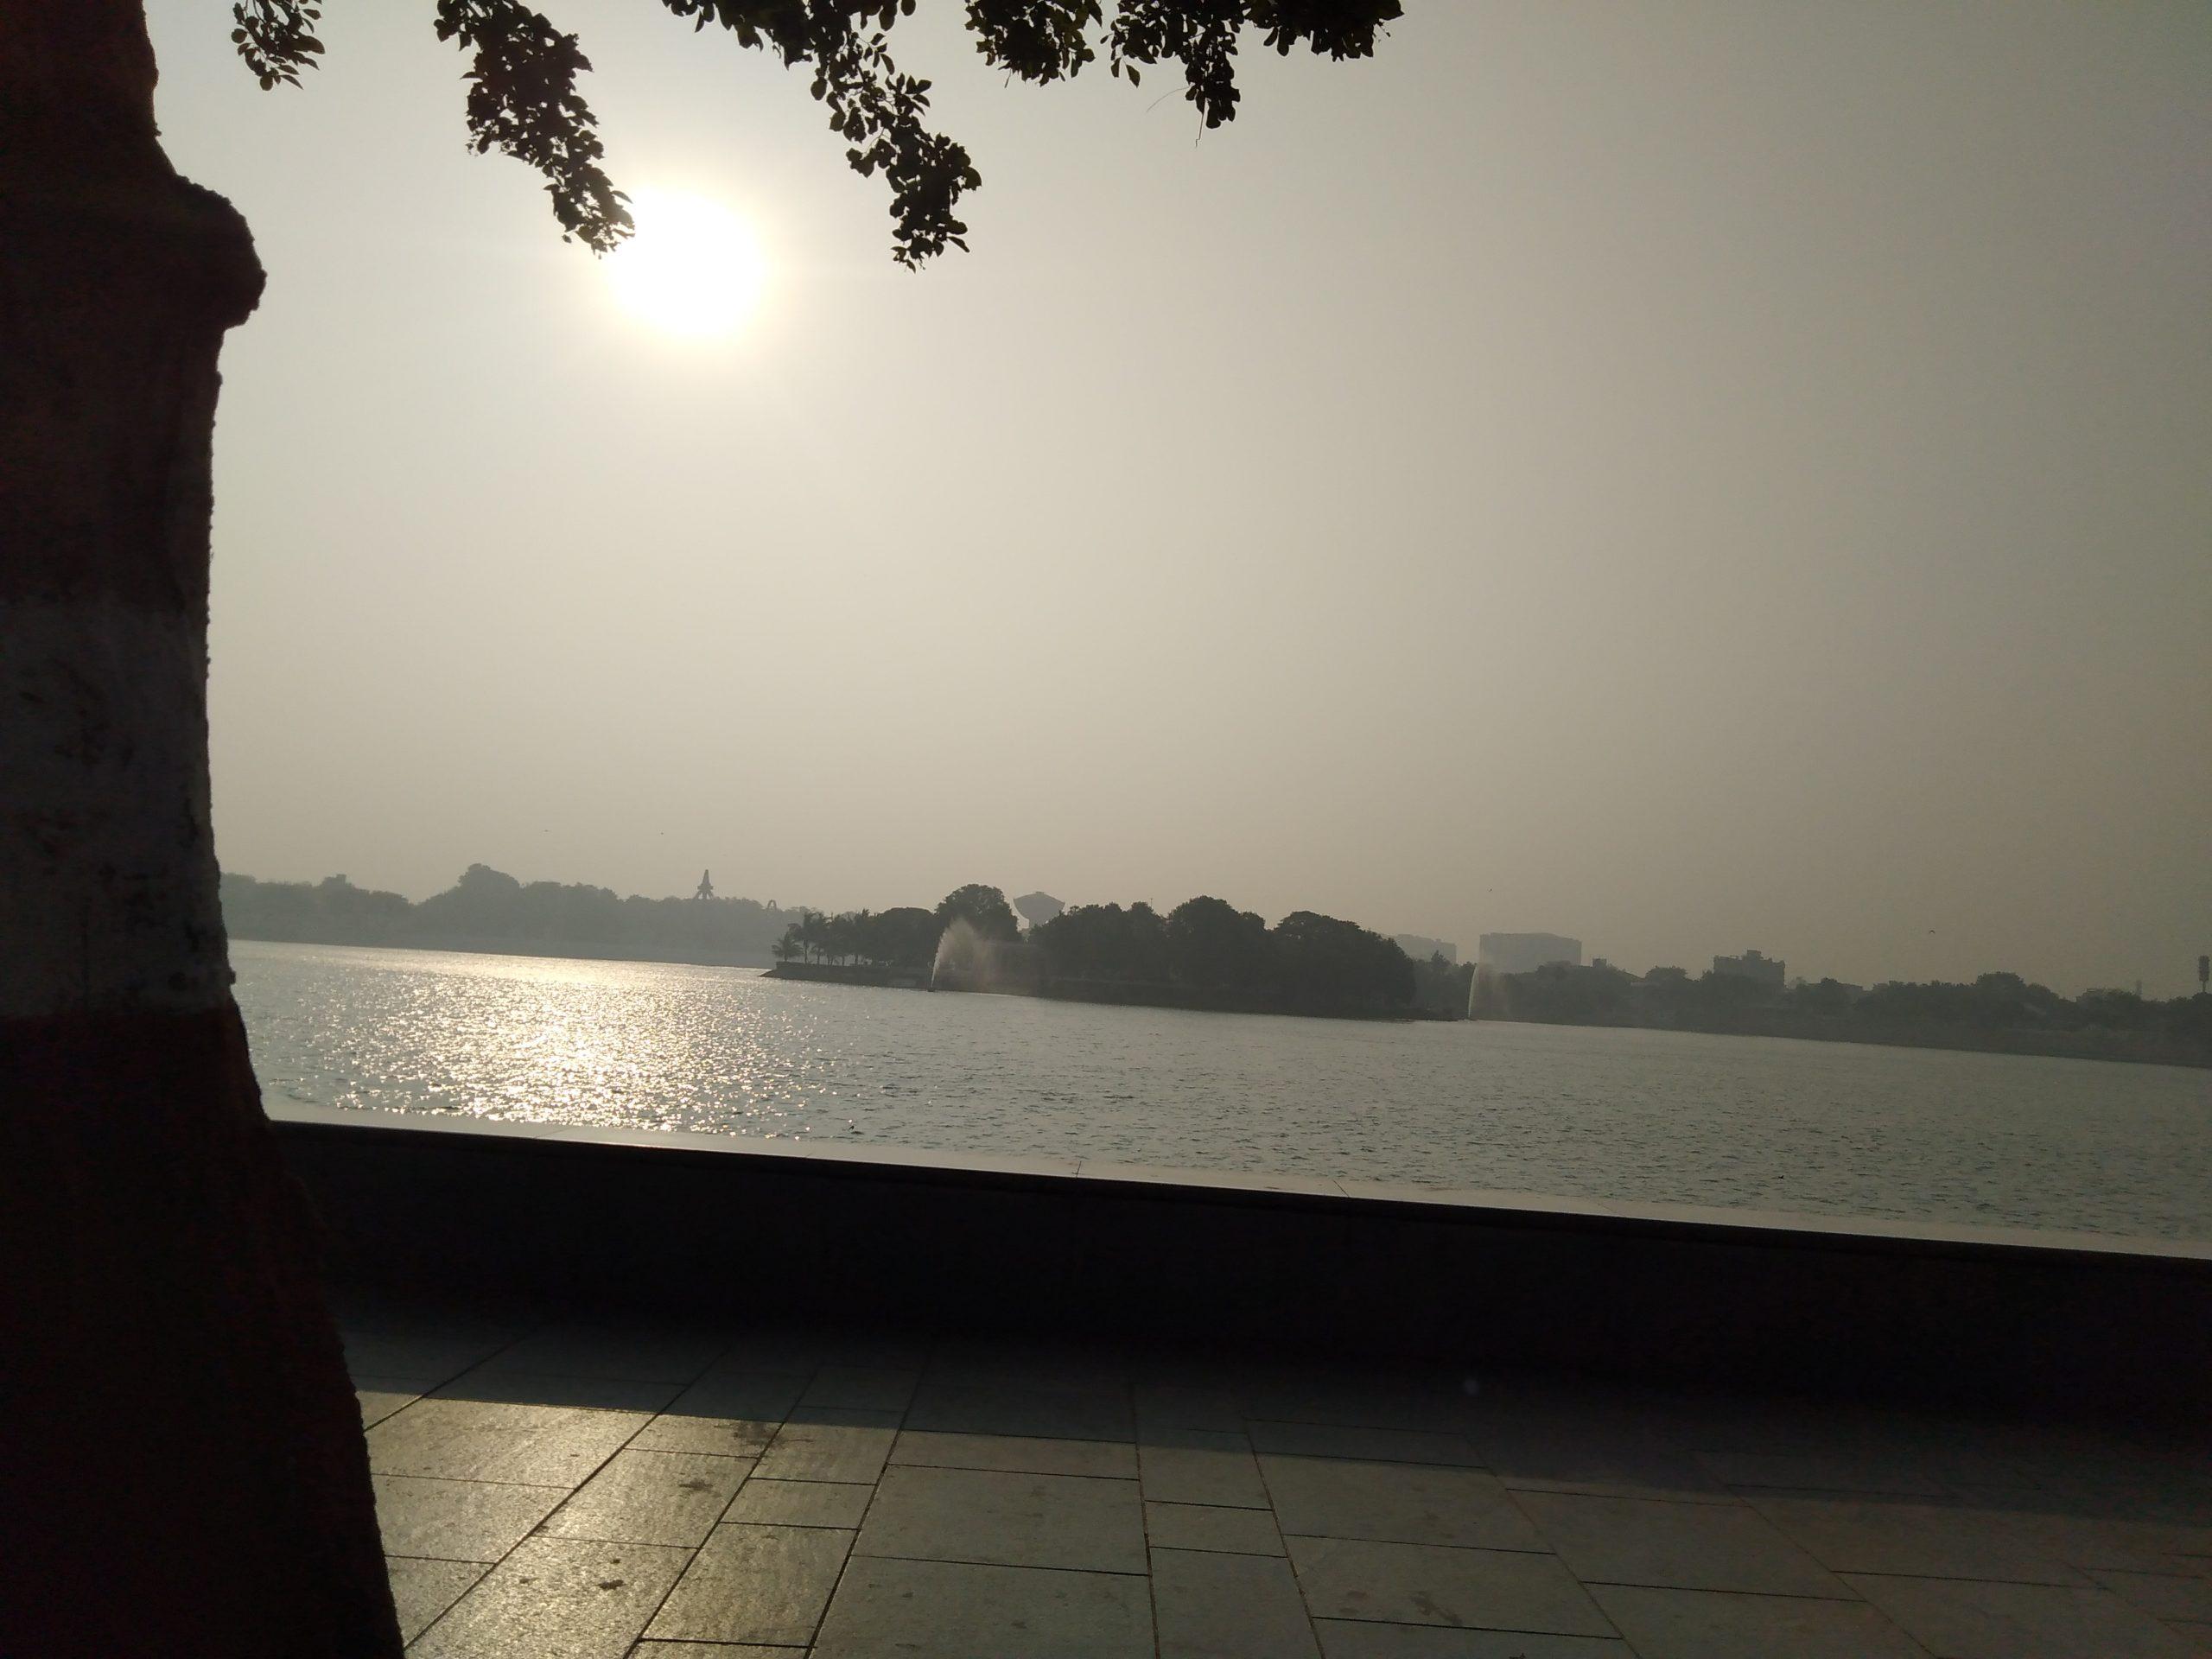 ahmedabad photo gallery